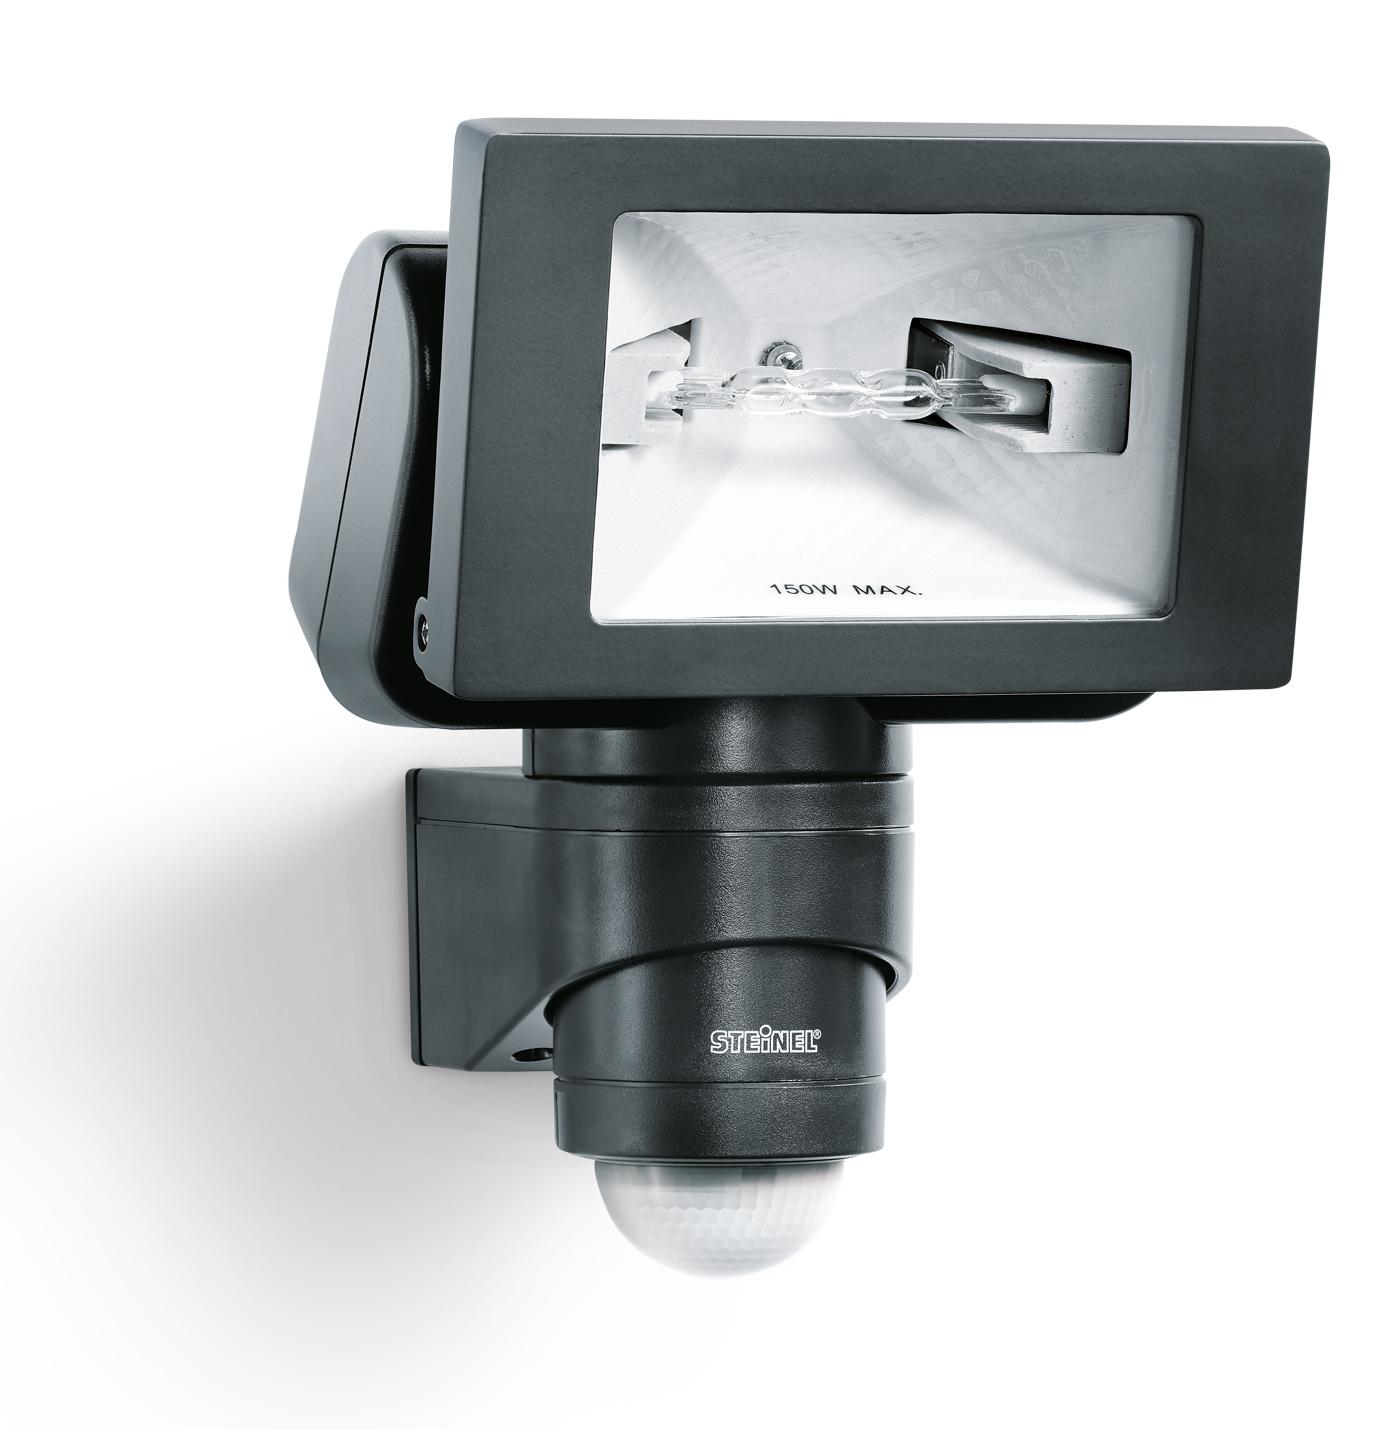 Steinel sensor halogenstrahler hs 150 duo schwarz 633011 for Hausfronten modern